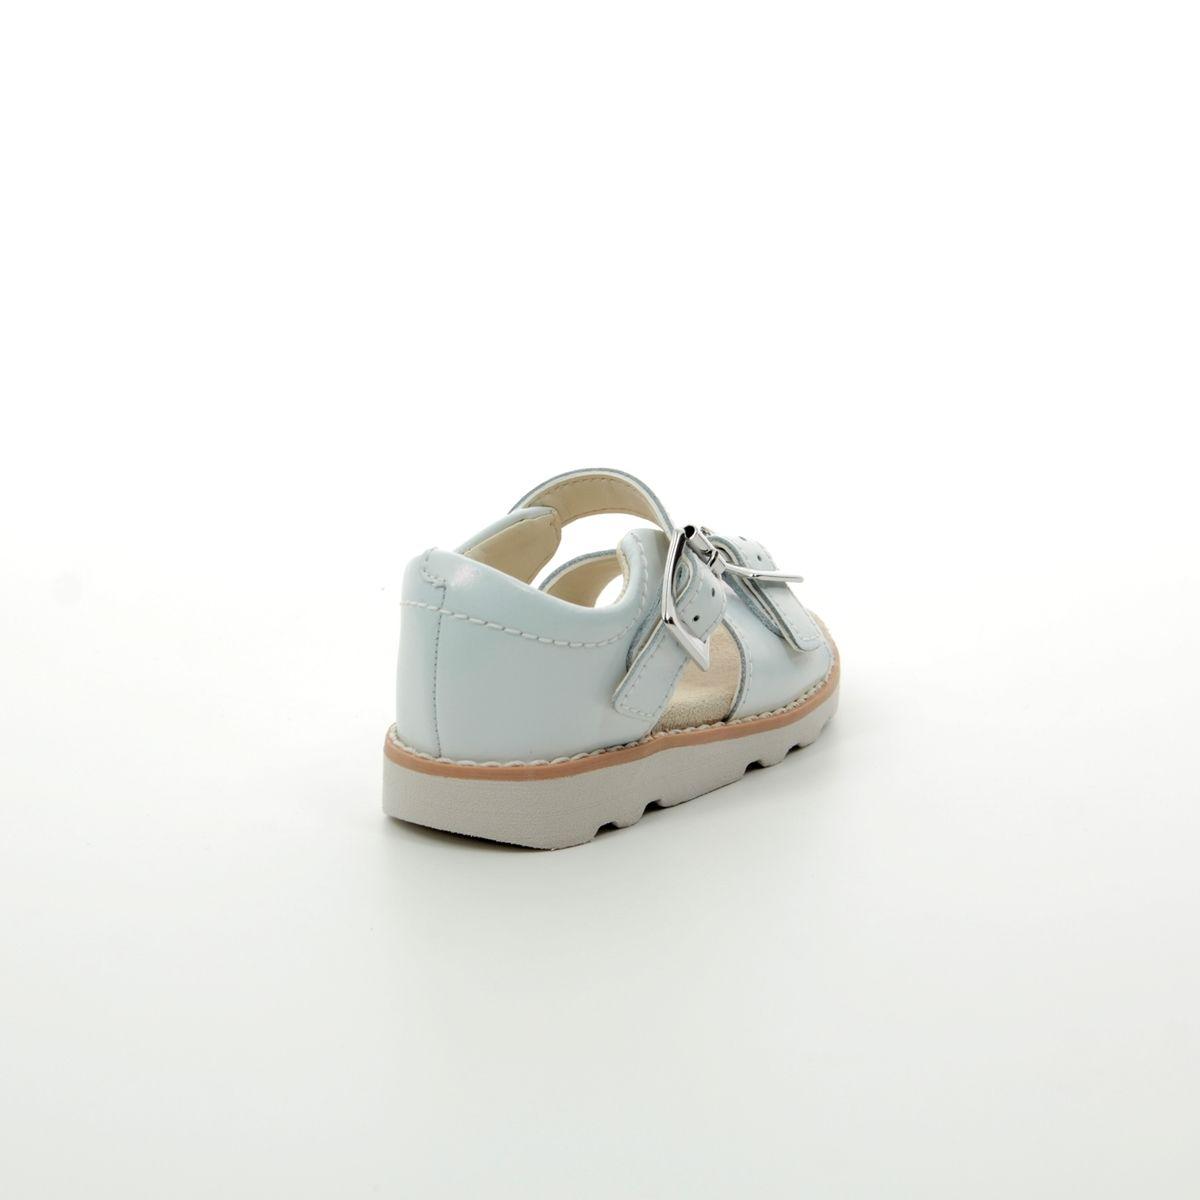 632b1928a Clarks Sandals - Silver - 411226F CROWN BLOOM T